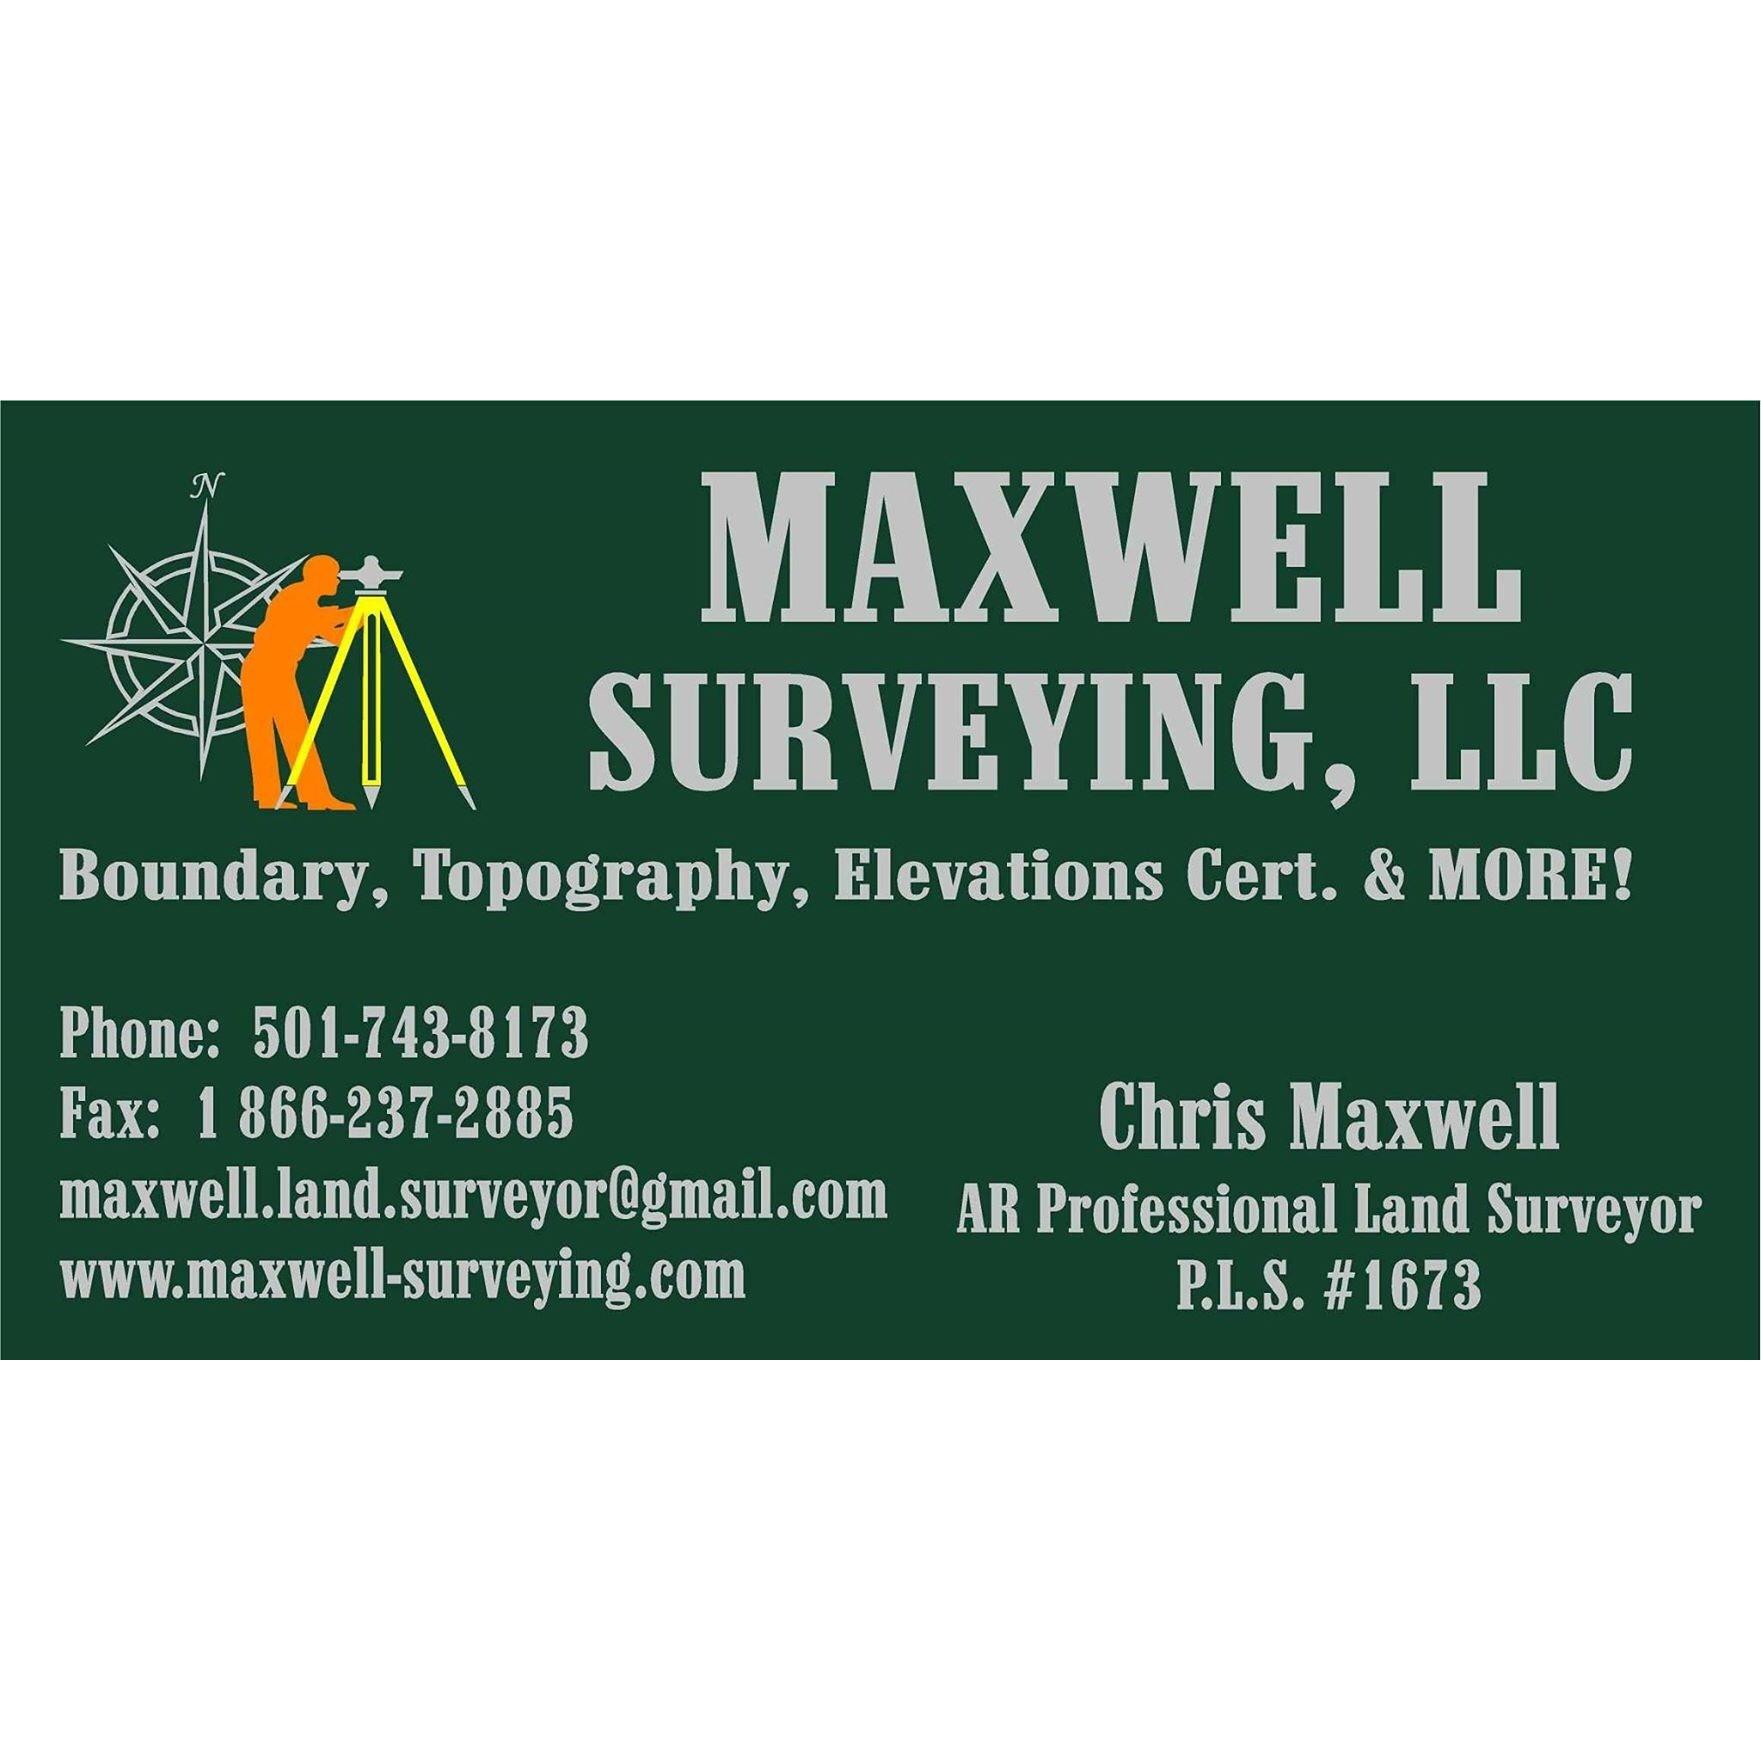 Maxwell Surveying LLC